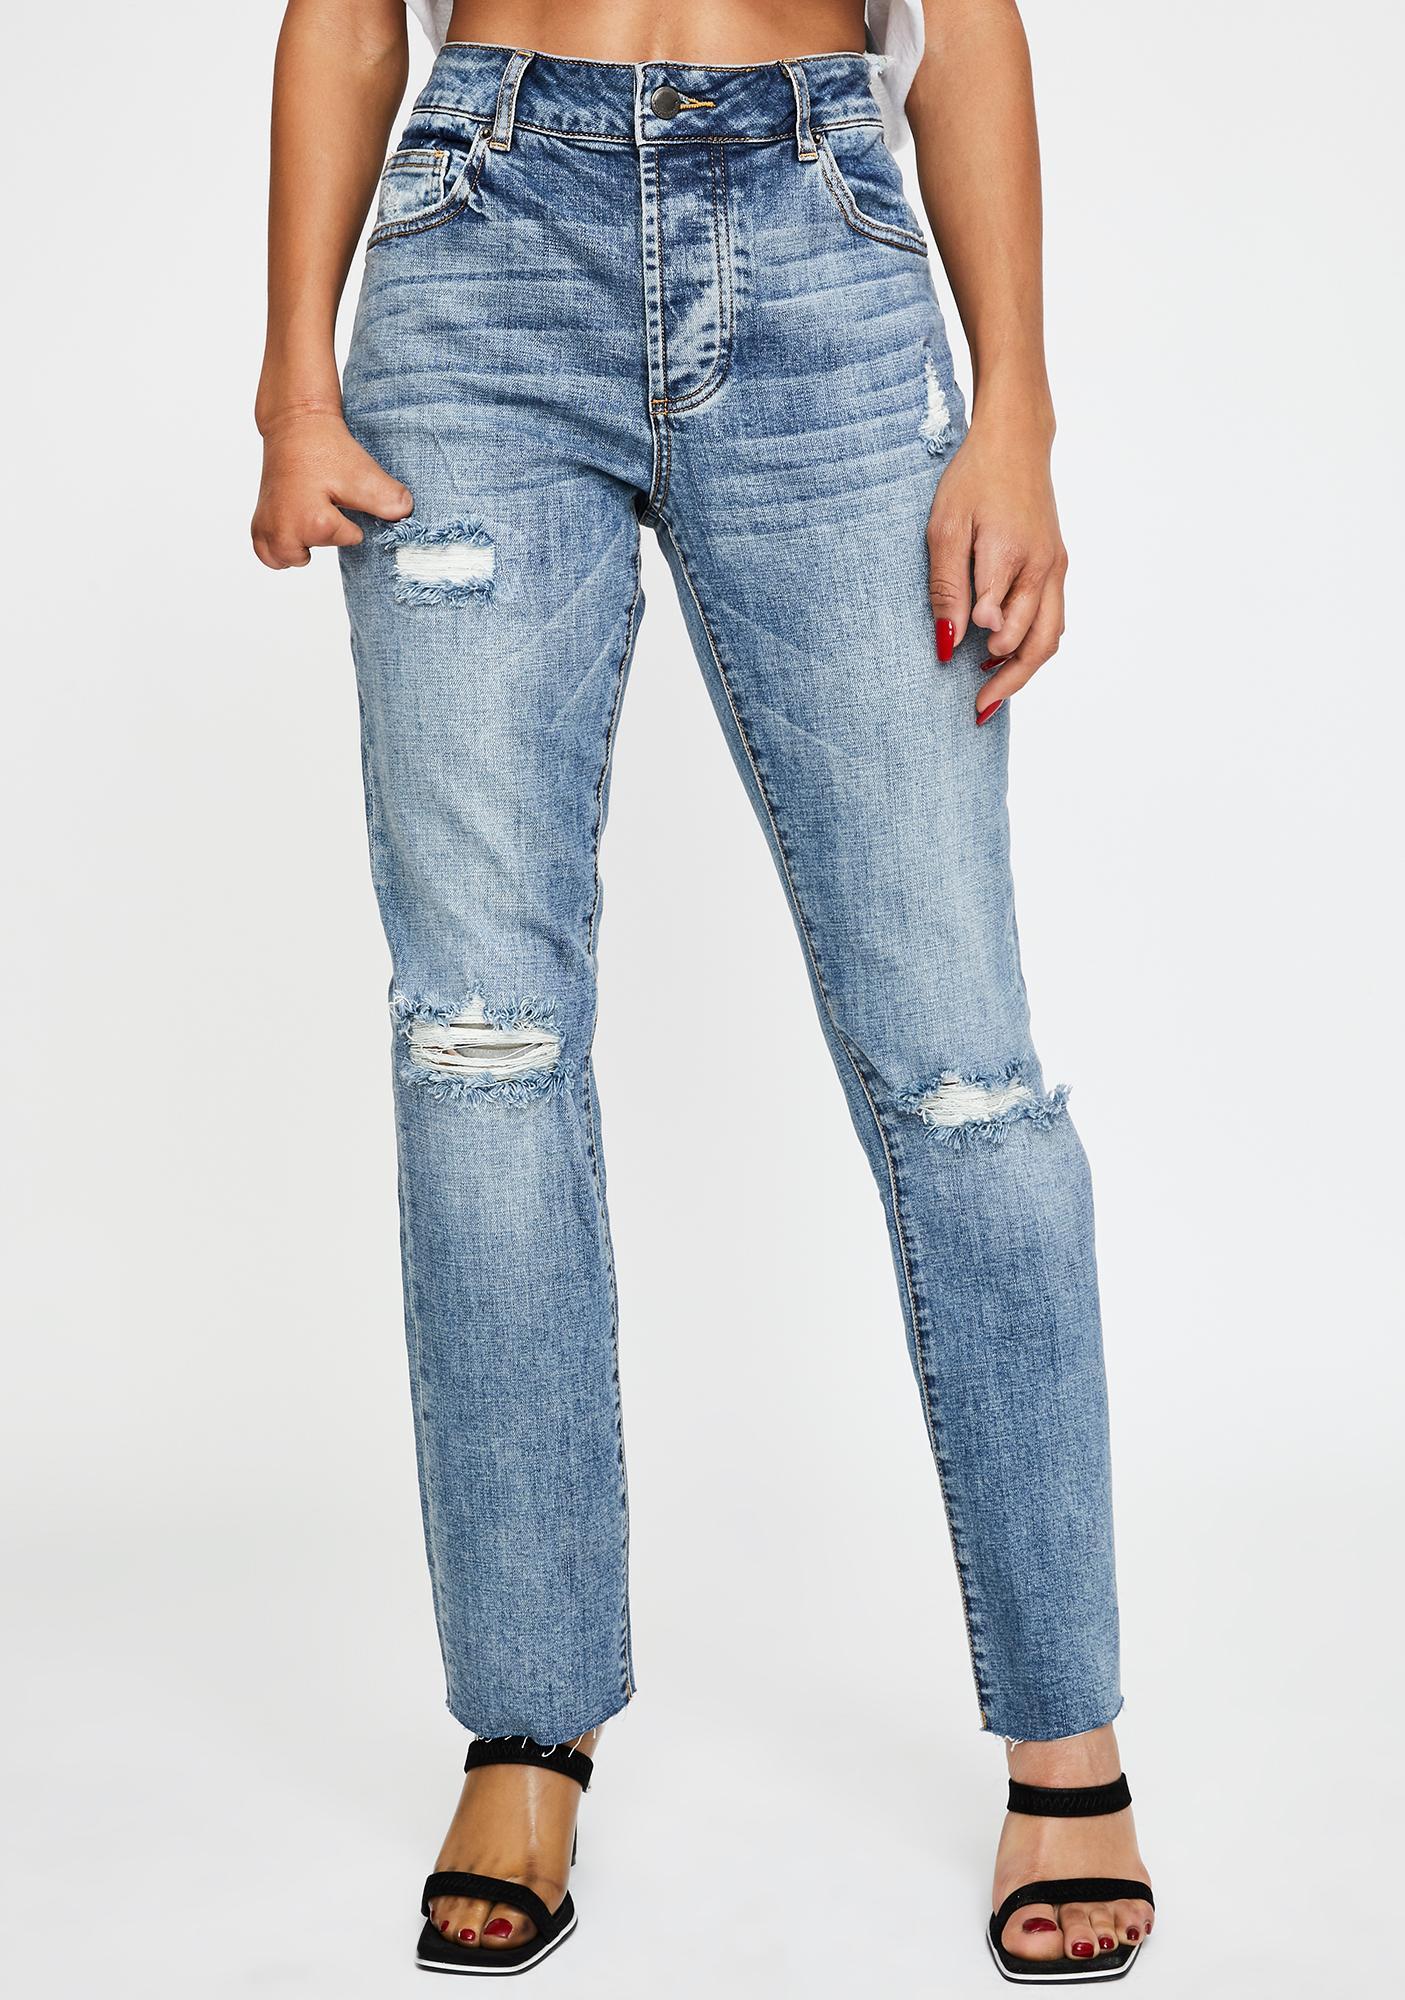 Oliver Logan Crosby Distressed Boyfriend Jeans